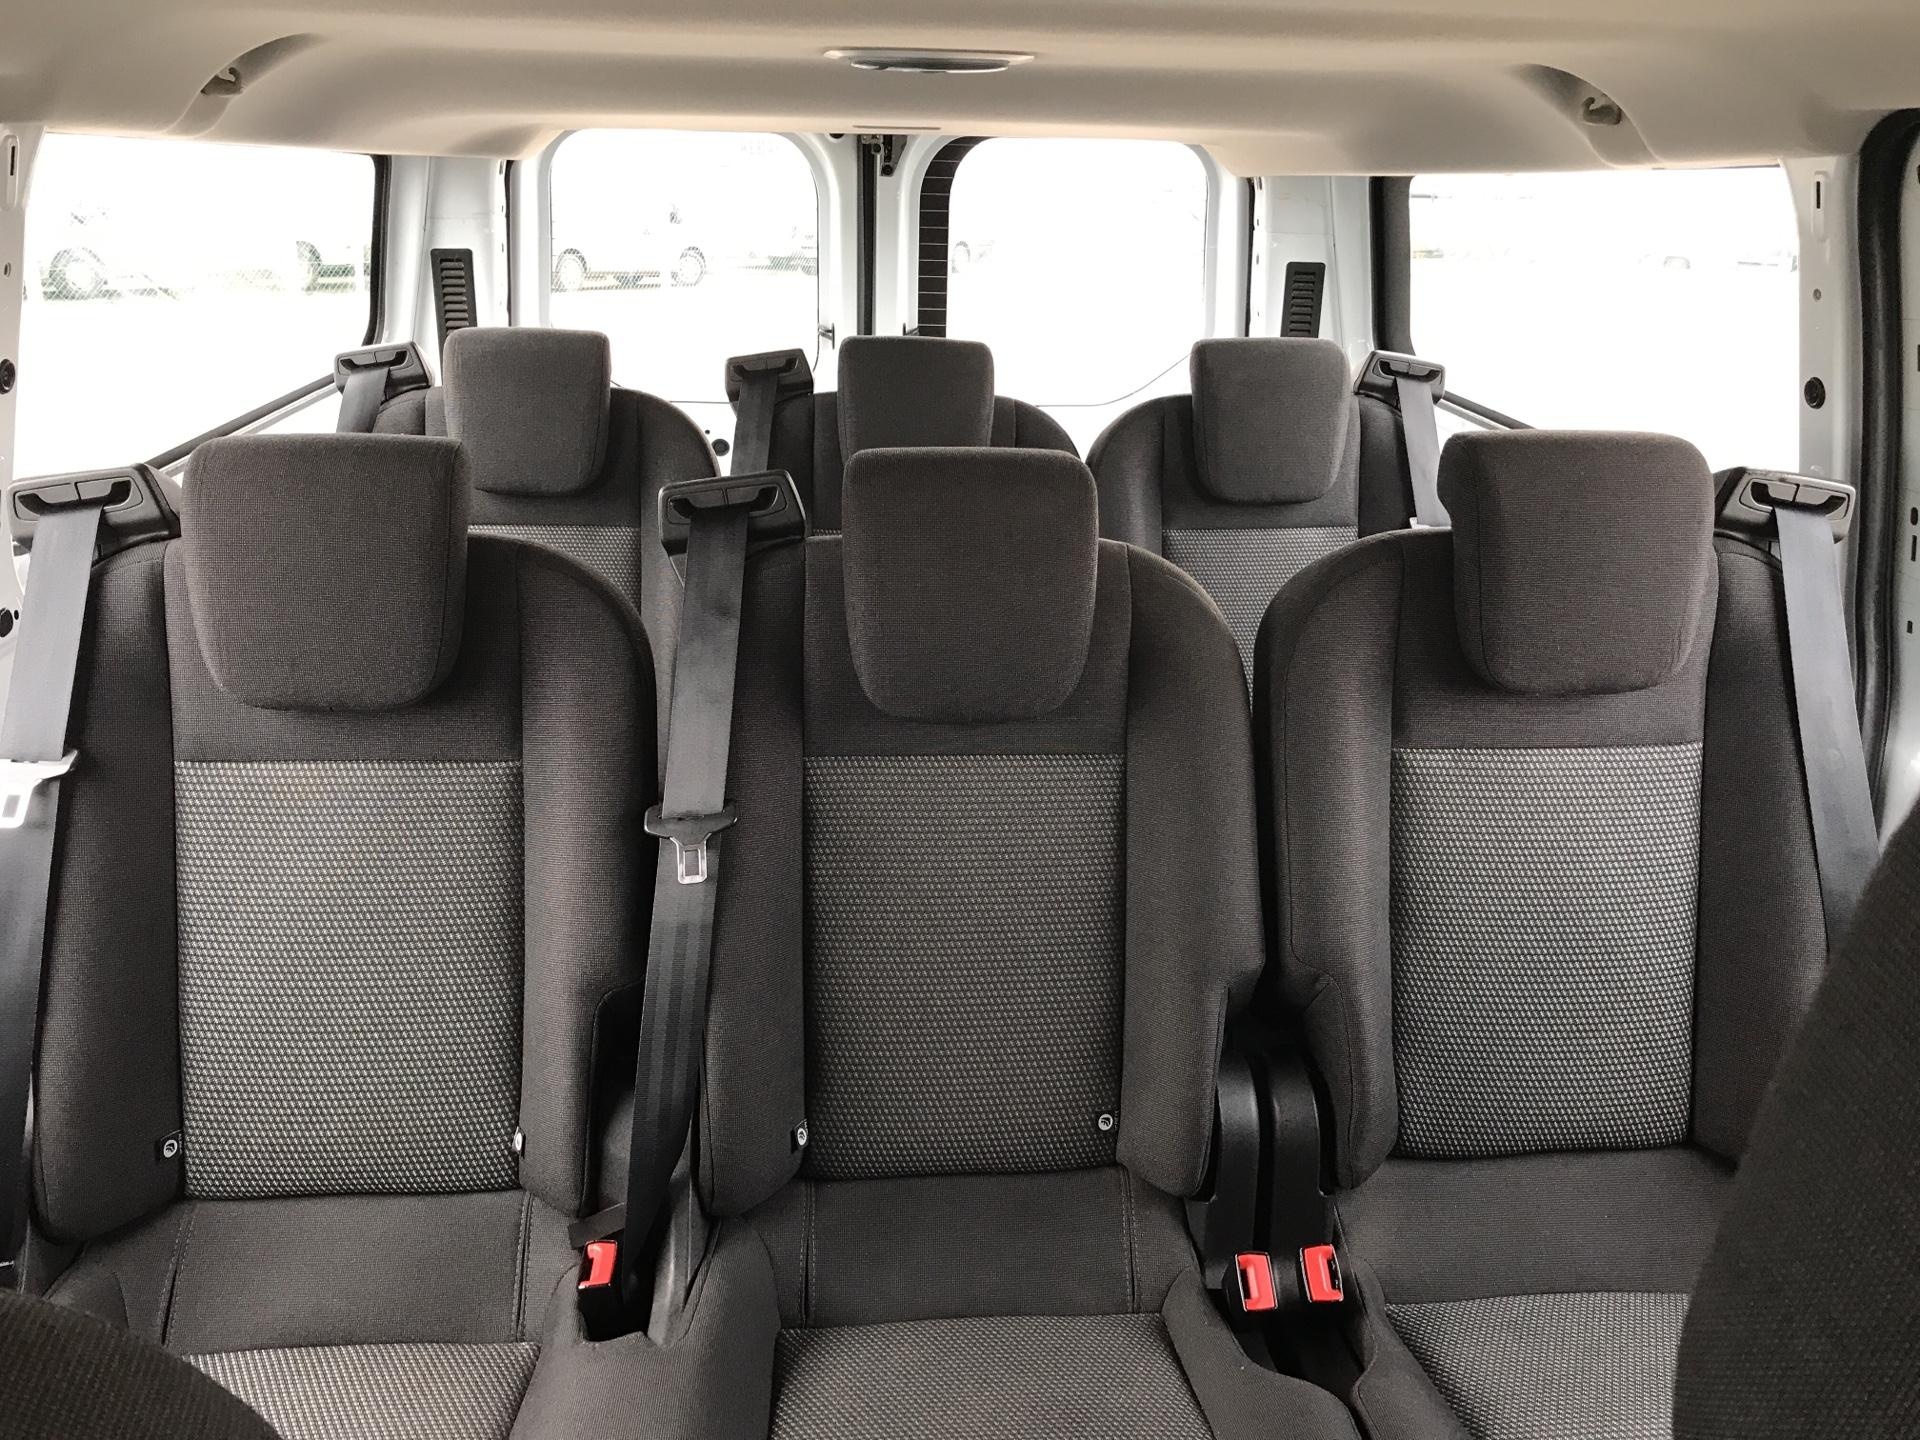 2015 Ford Transit Custom 310 L2 DIESEL FWD 2.2 TDCI 125PS LOW ROOF KOMBI VAN EURO 5 VAT INC (WV15JNJ) Image 17